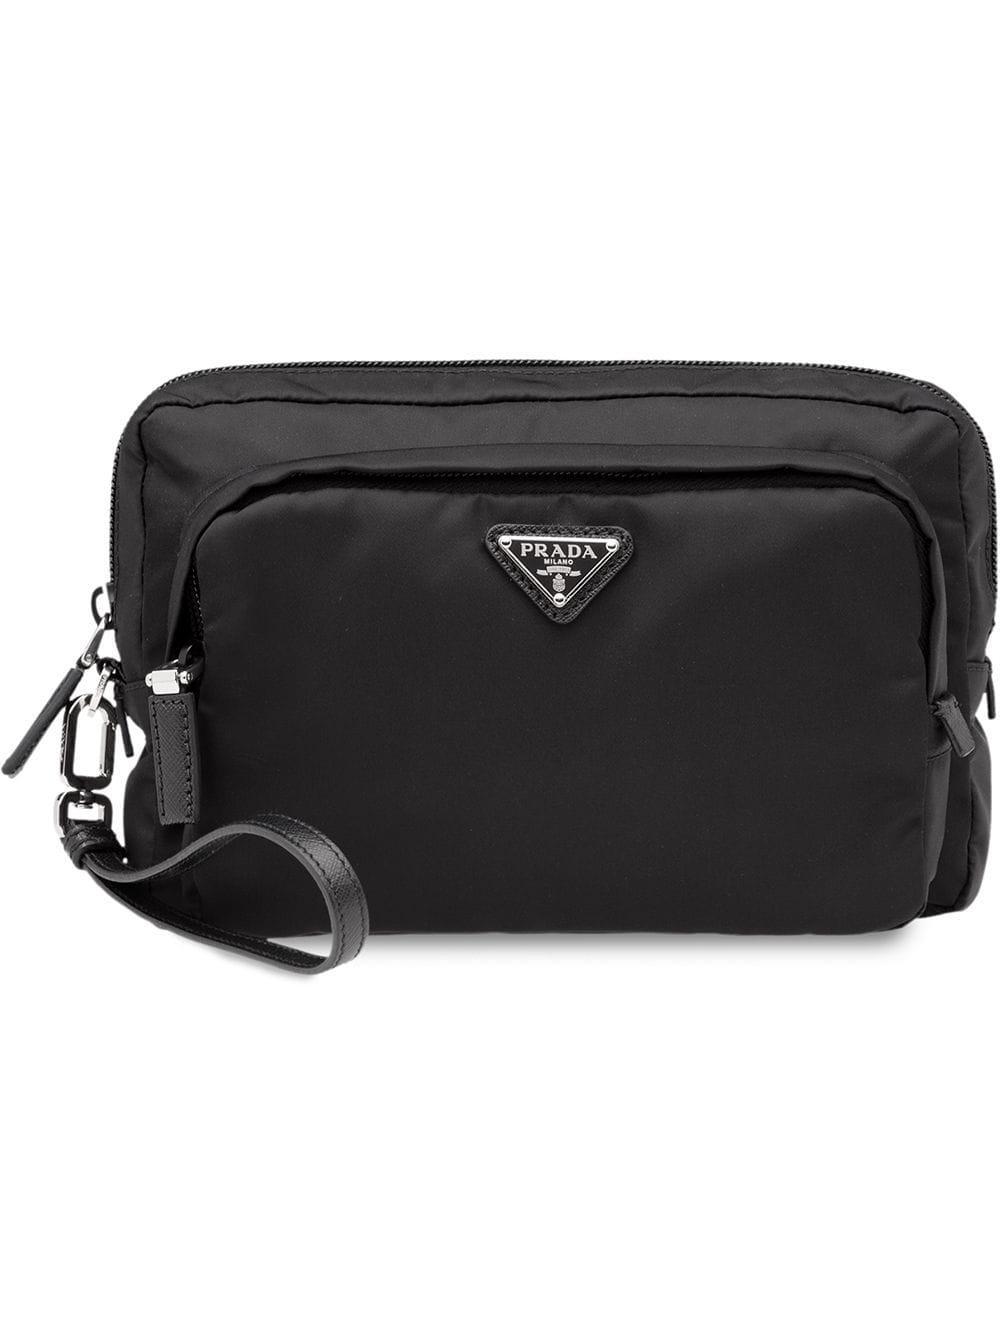 9d02b6f3f244 Prada - Logo Embellished Nylon Camera Pouch - Mens - Black | ModeSens